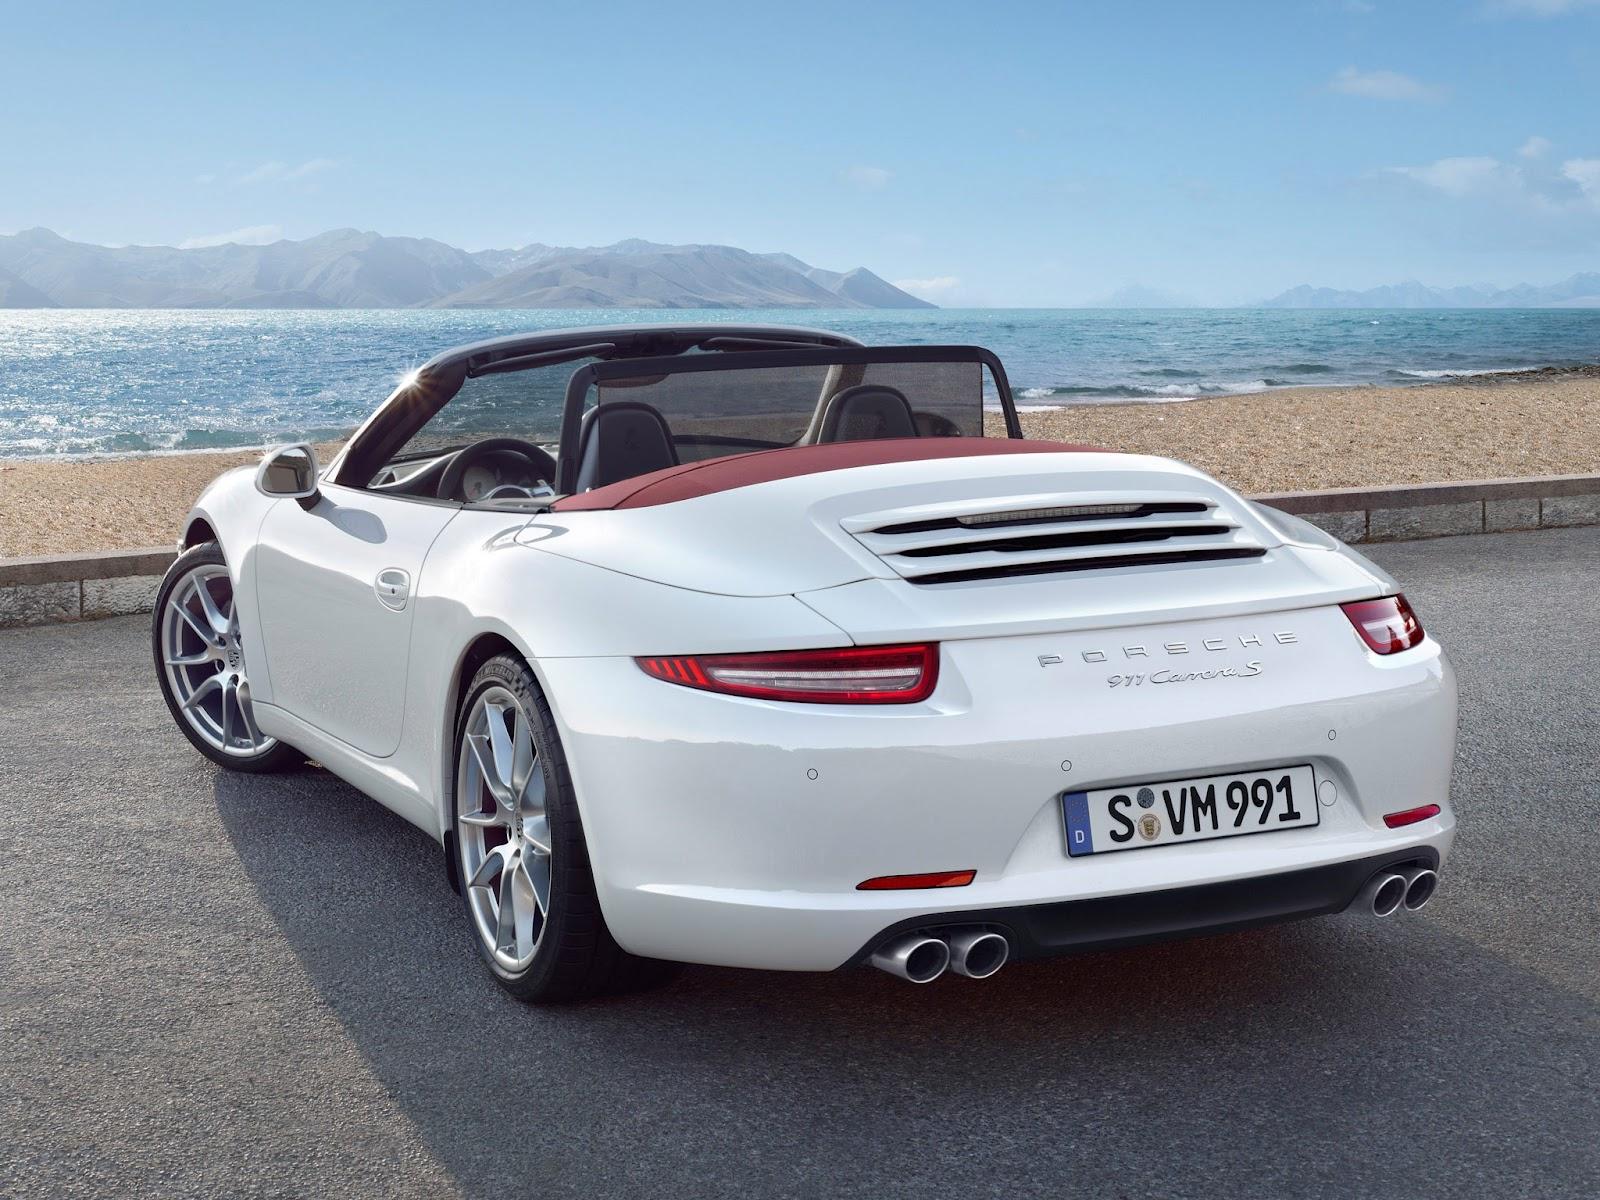 2016 Porsche 911 Carrera Gts 4 Cabriolet Wallpapers For